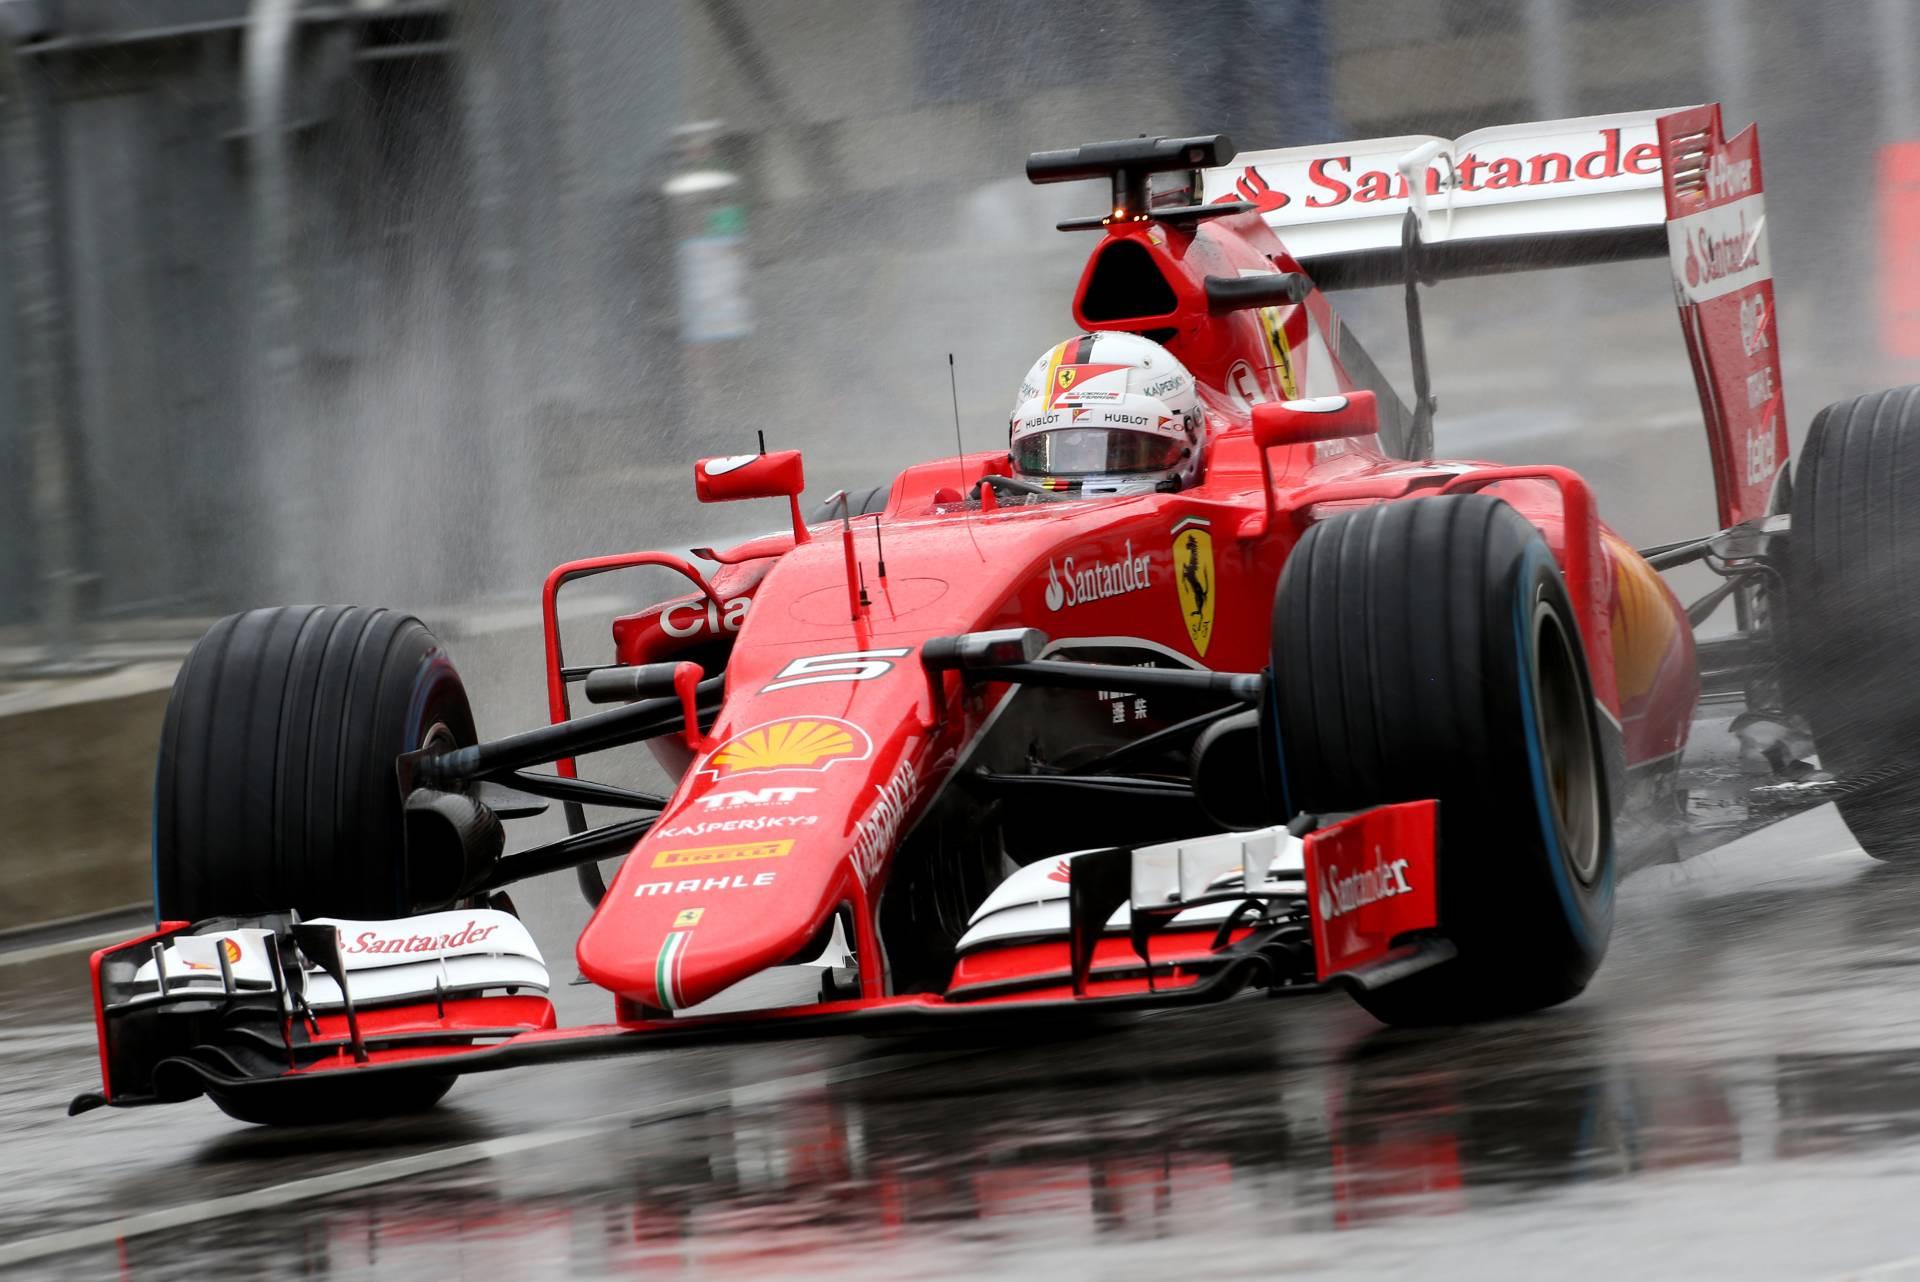 F1 Wallpaper Sebastian Vettel Ferrari